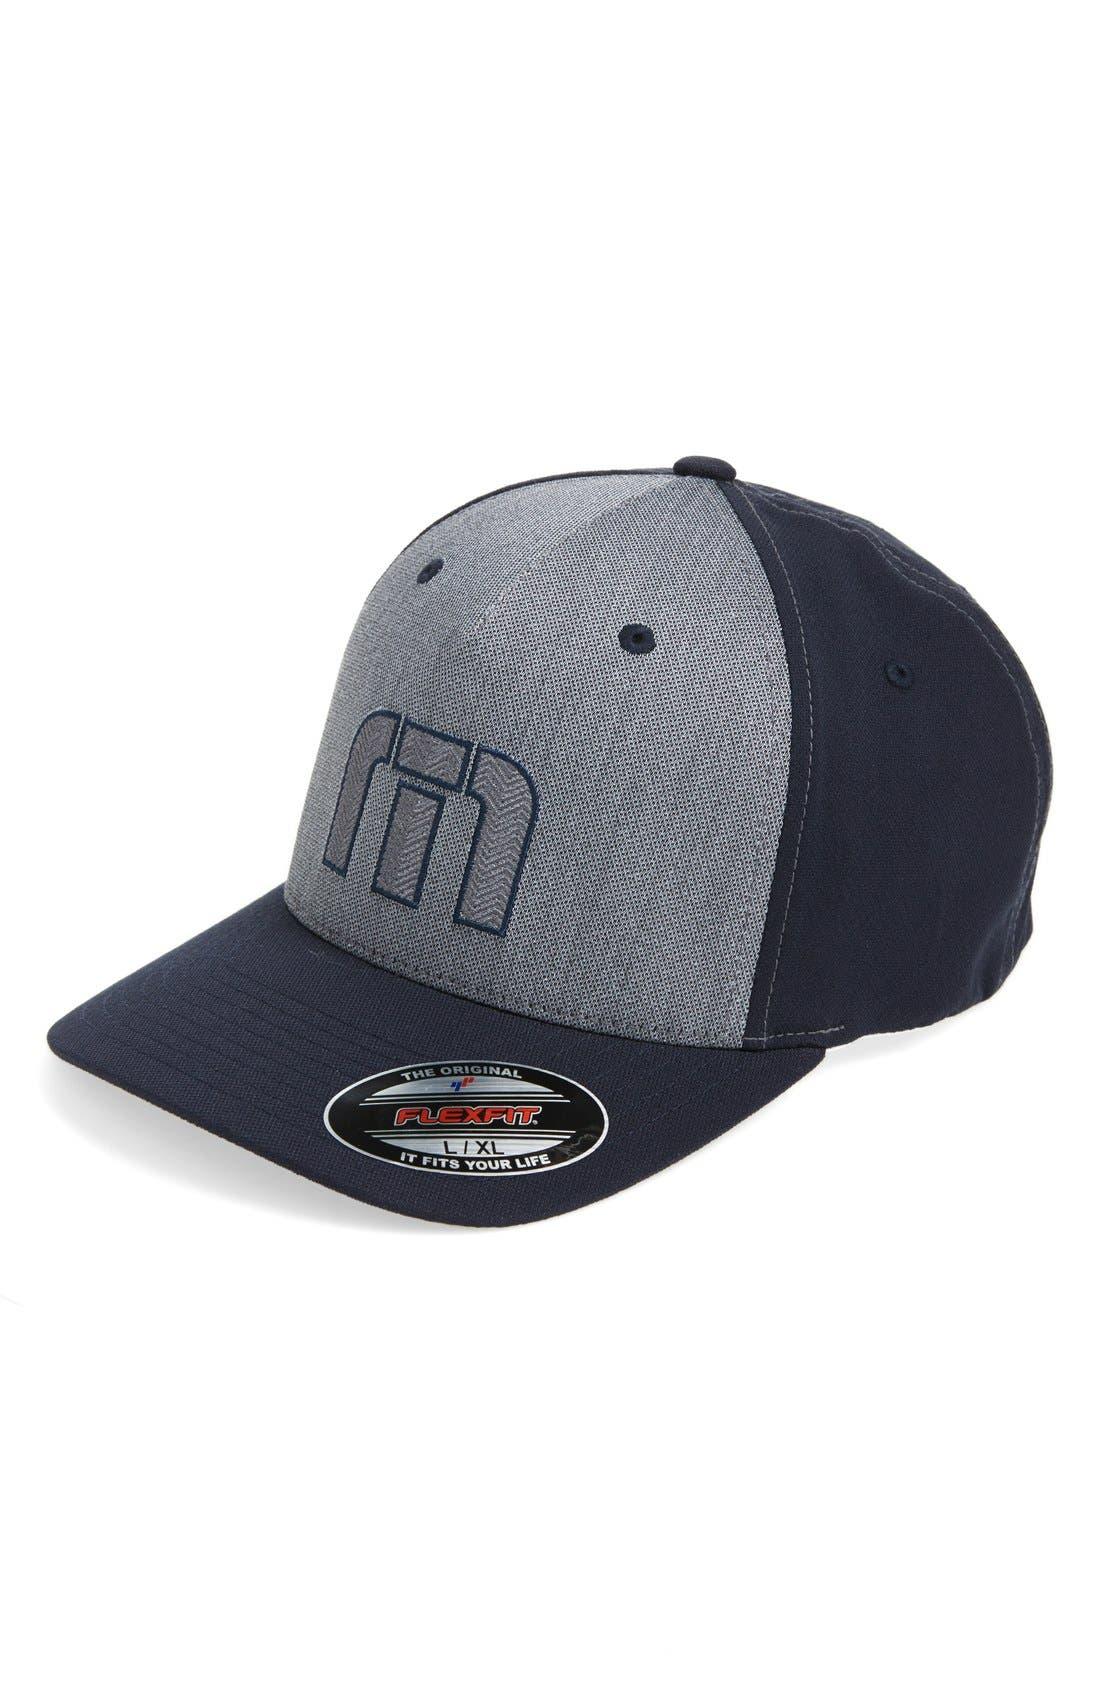 Alternate Image 1 Selected - Travis Mathew 'Mullins' Baseball Cap